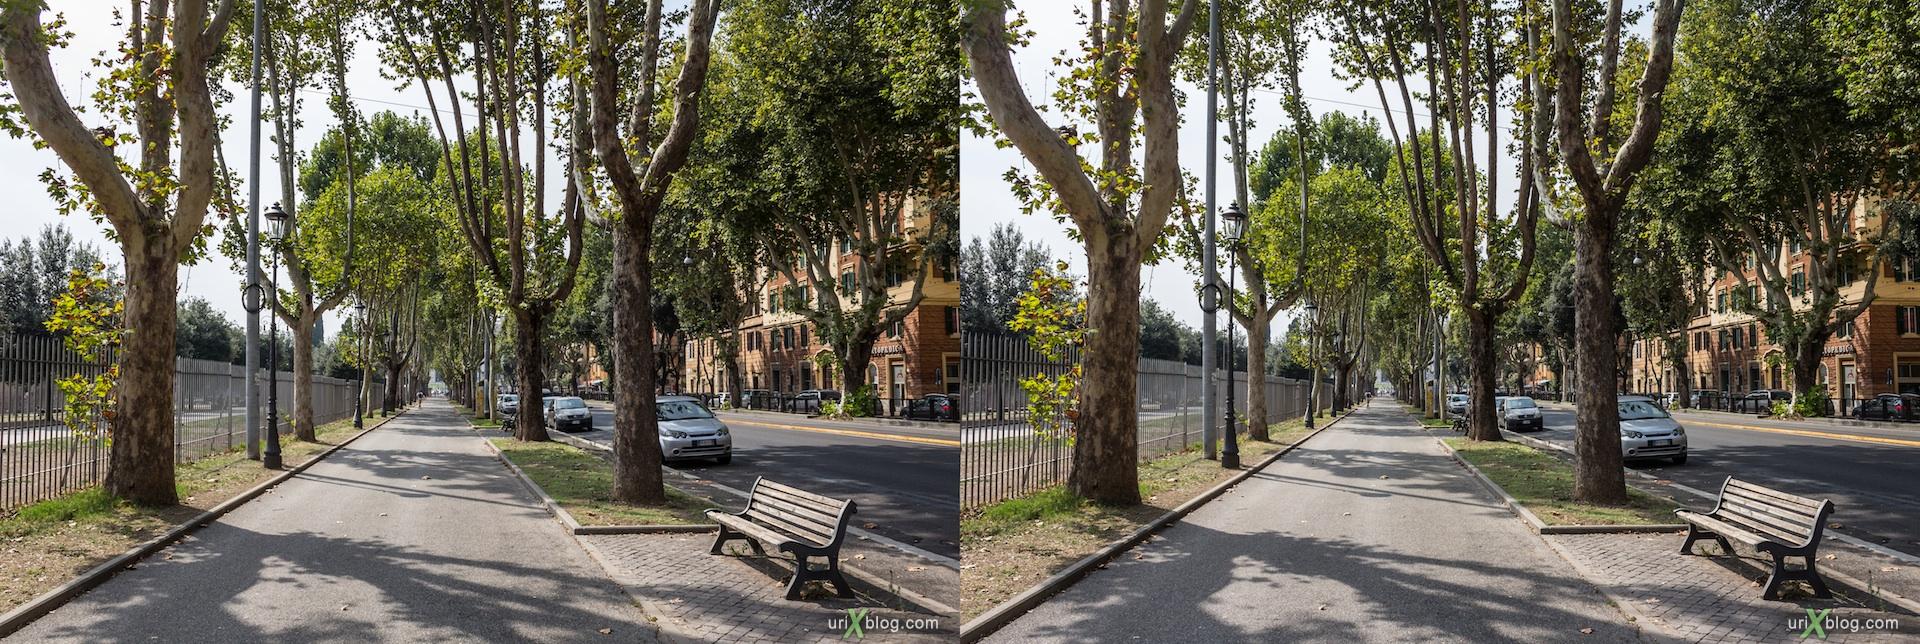 2012, Viale Carlo Felice avenue, trees, street, 3D, stereo pair, cross-eyed, crossview, cross view stereo pair